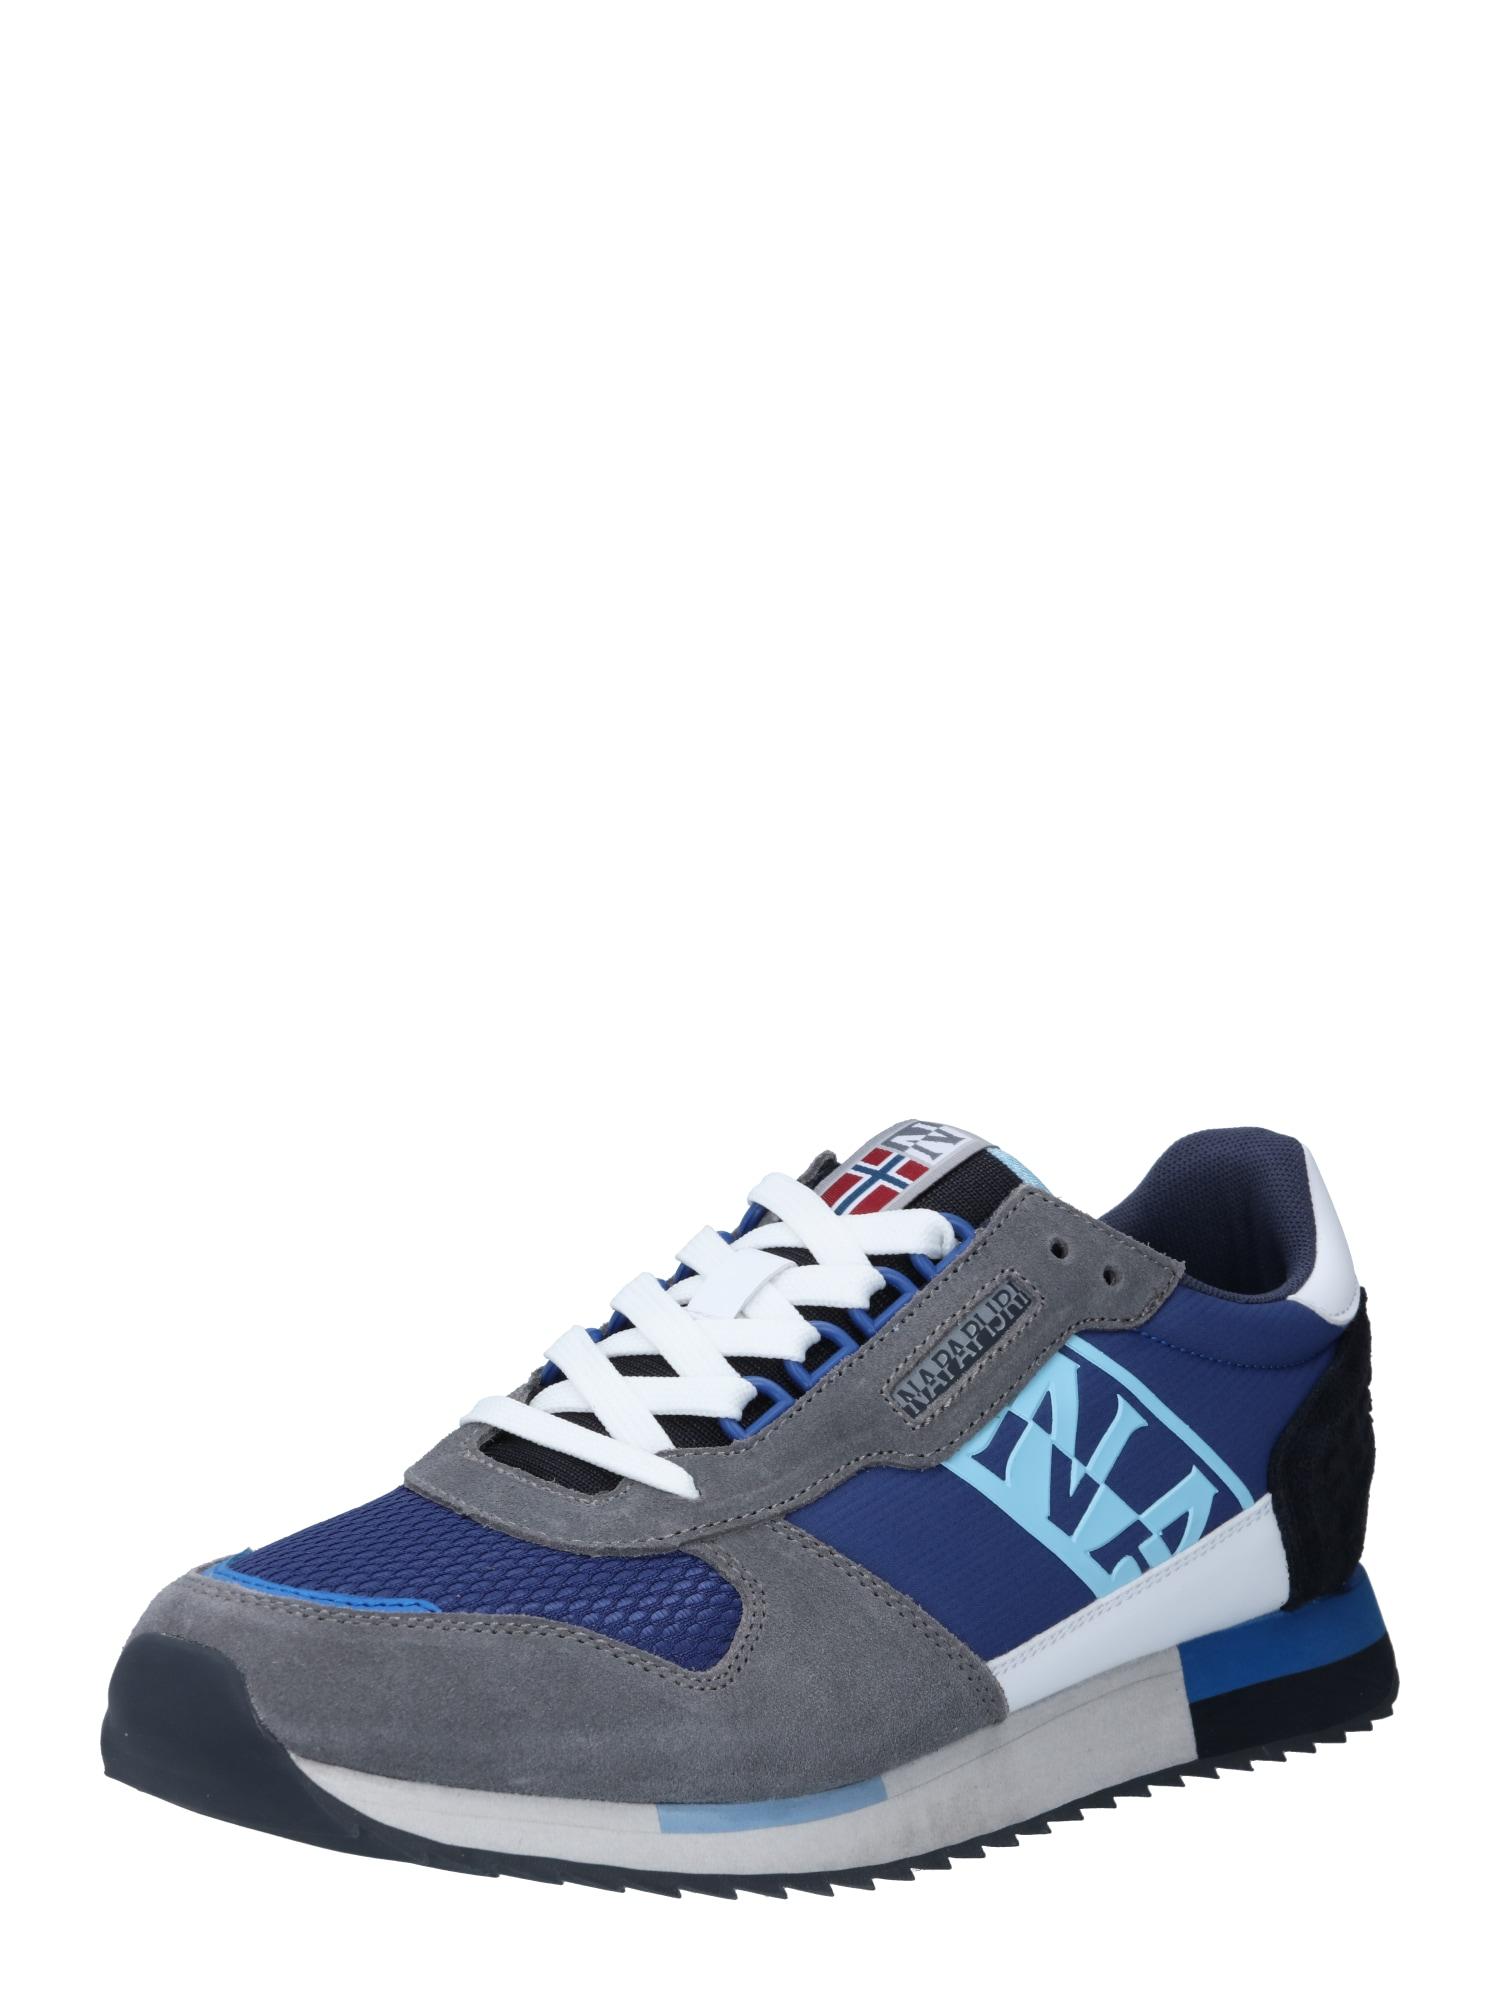 NAPAPIJRI Tenisky 'S1VIRTUS01/NYS'  modrá / chladná modrá / bílá